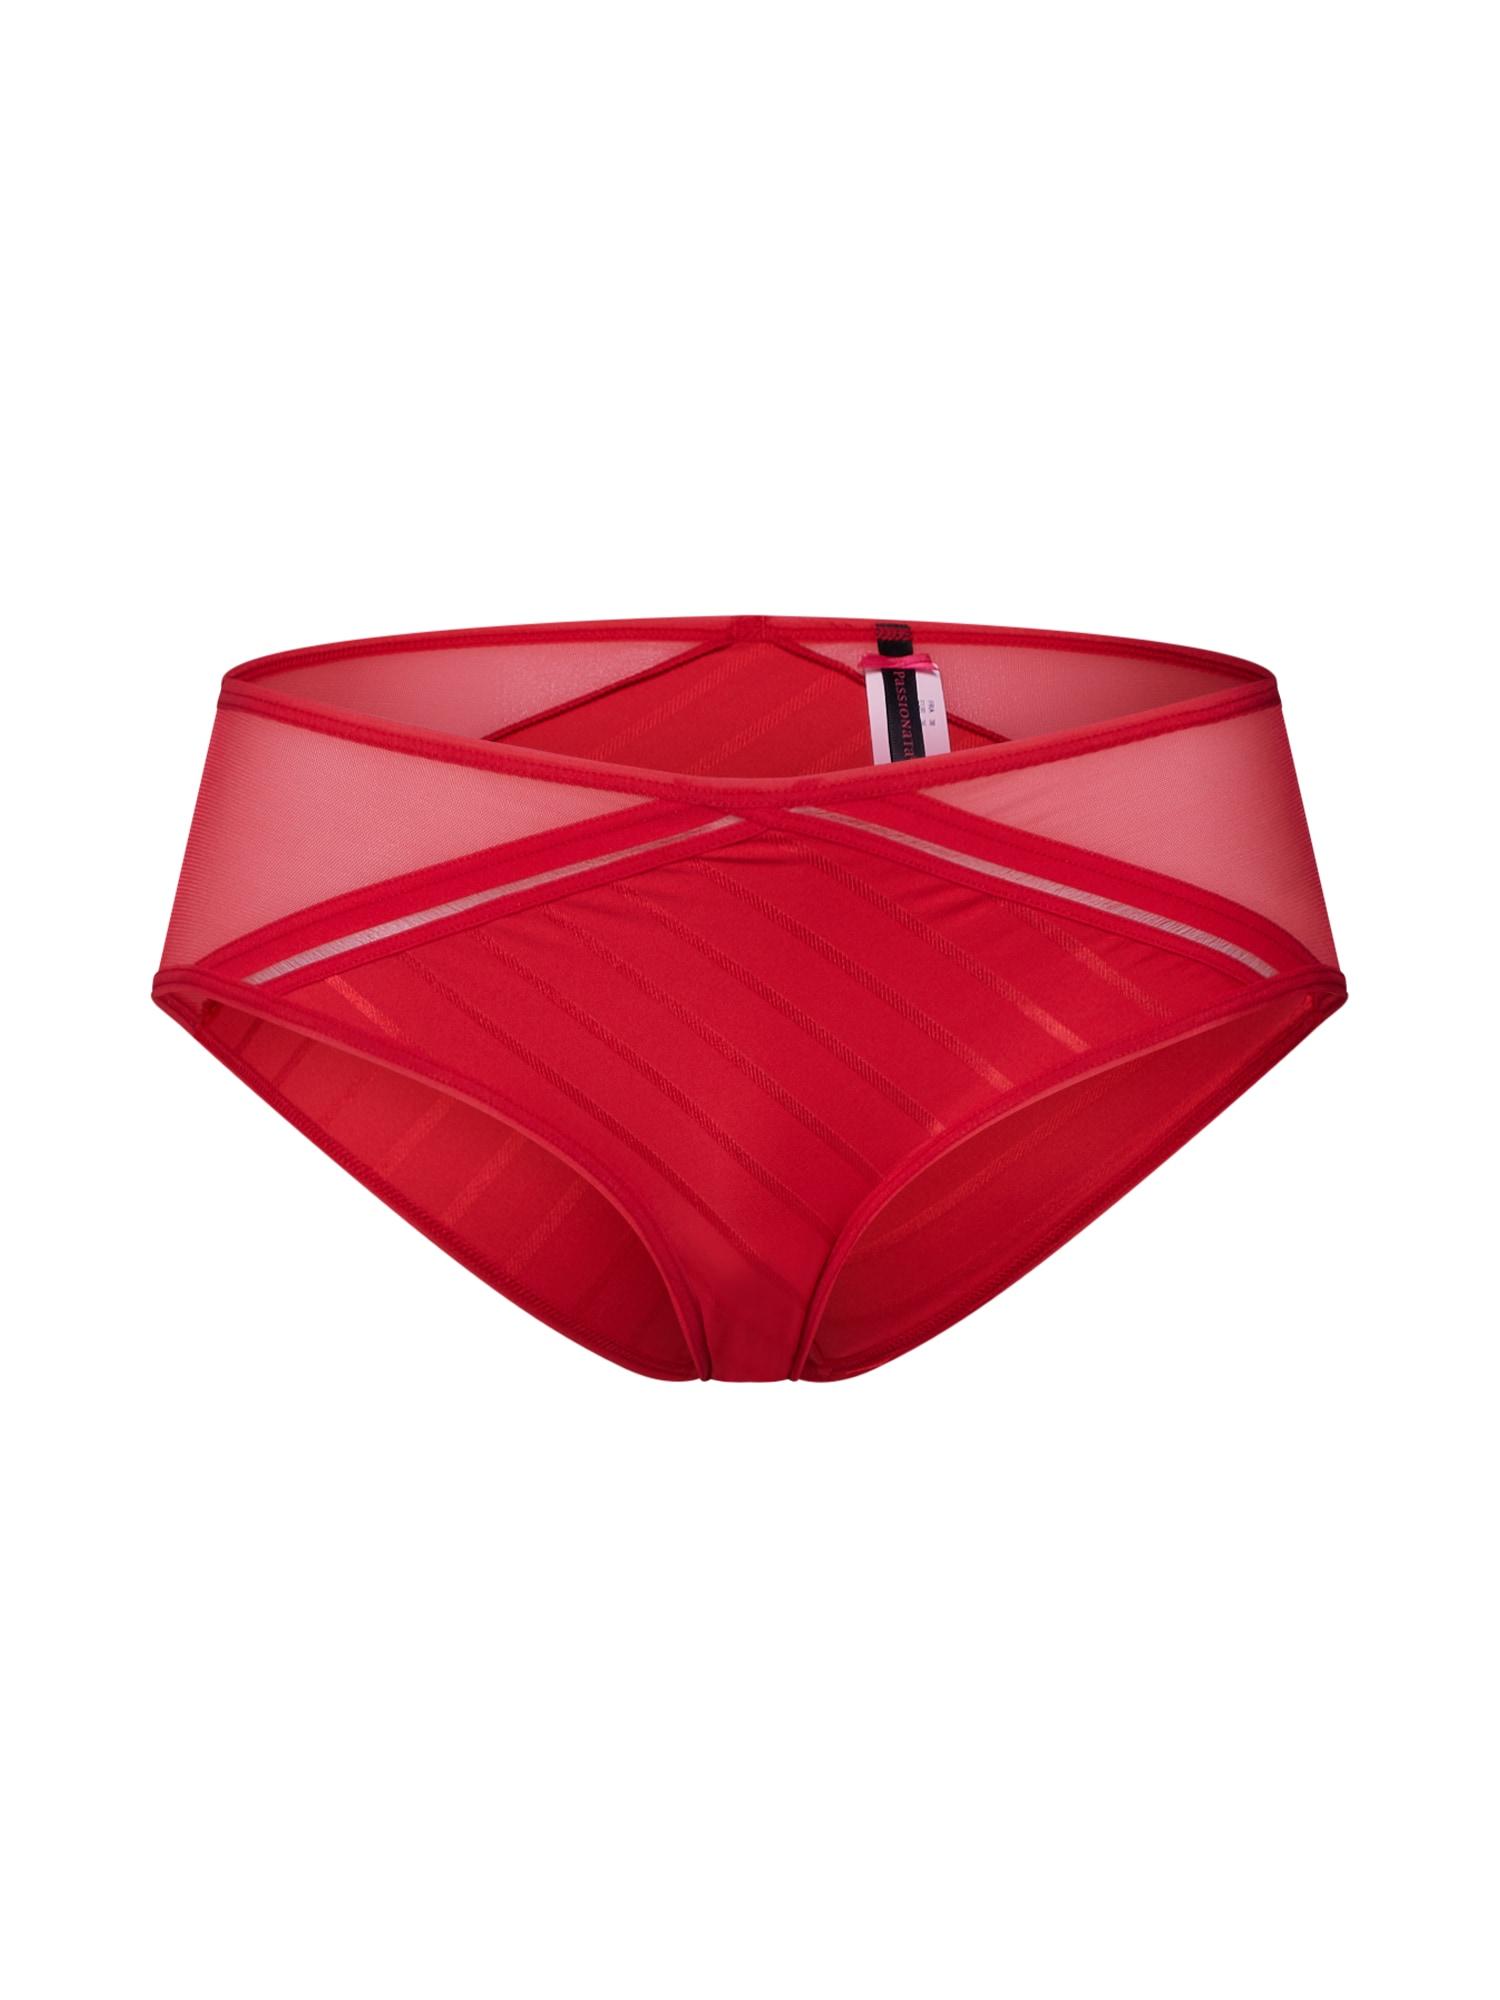 Kalhotky GRAPHIC červená PASSIONATA